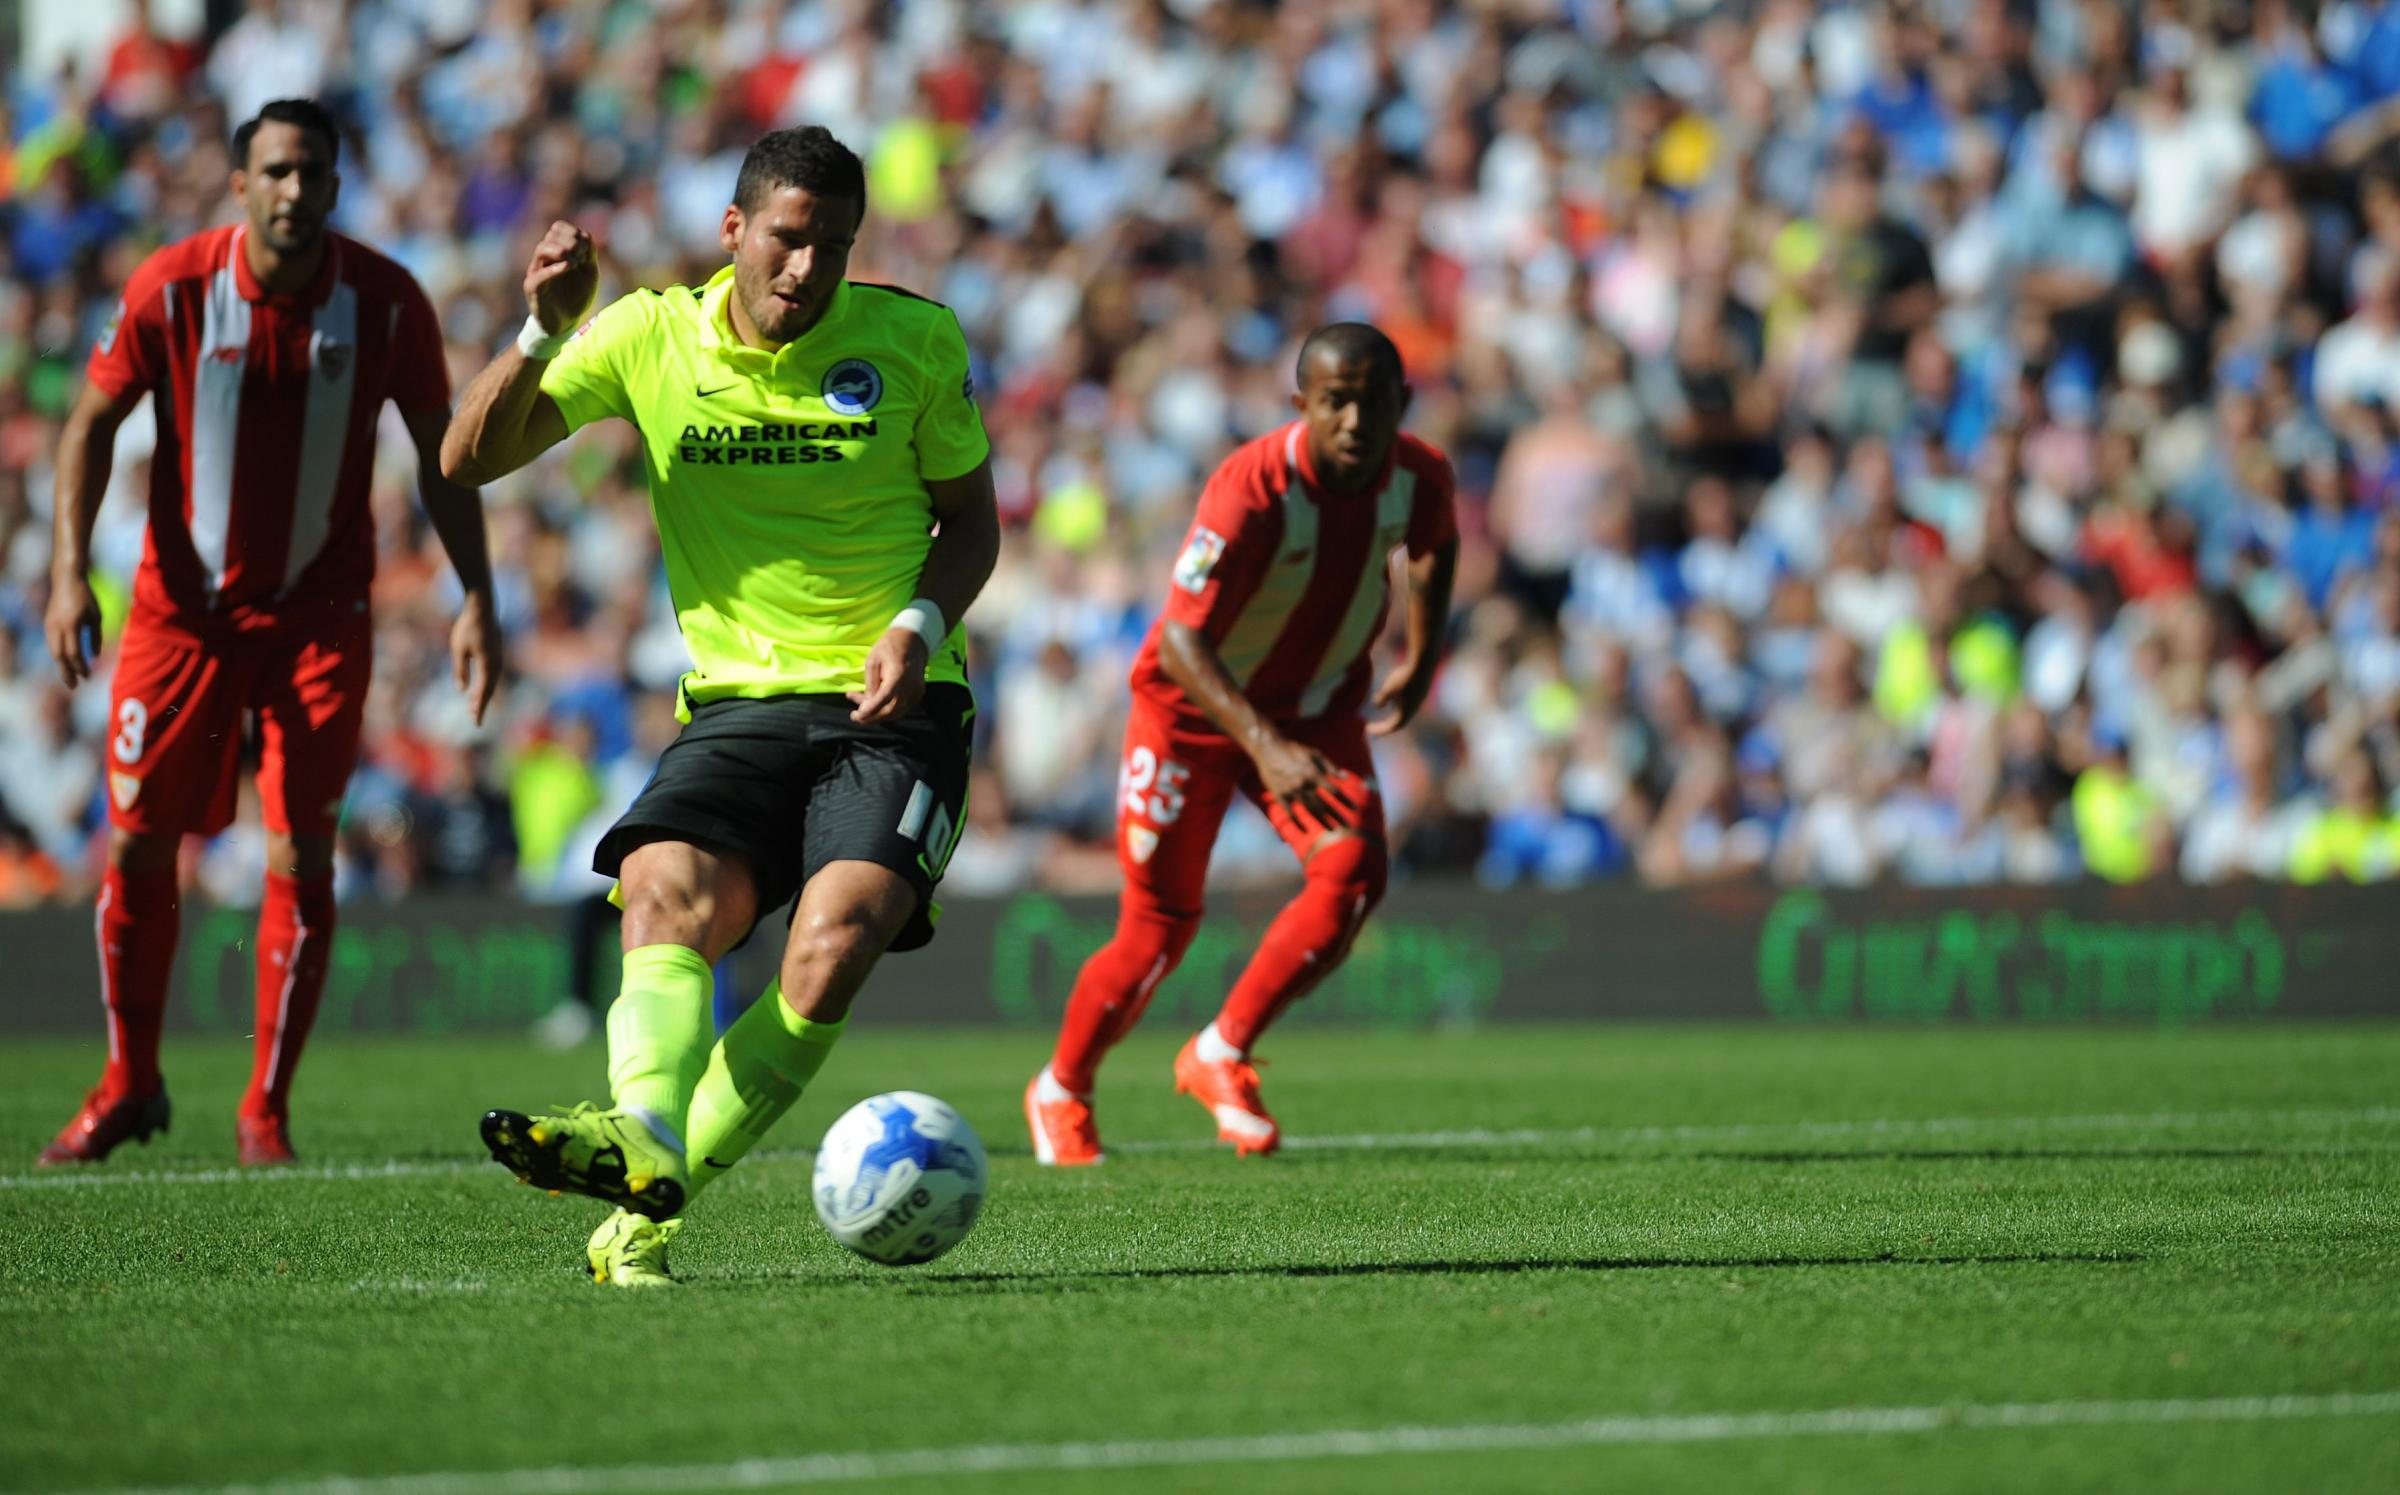 Brighton v Getafe might offer some clues for Premier League